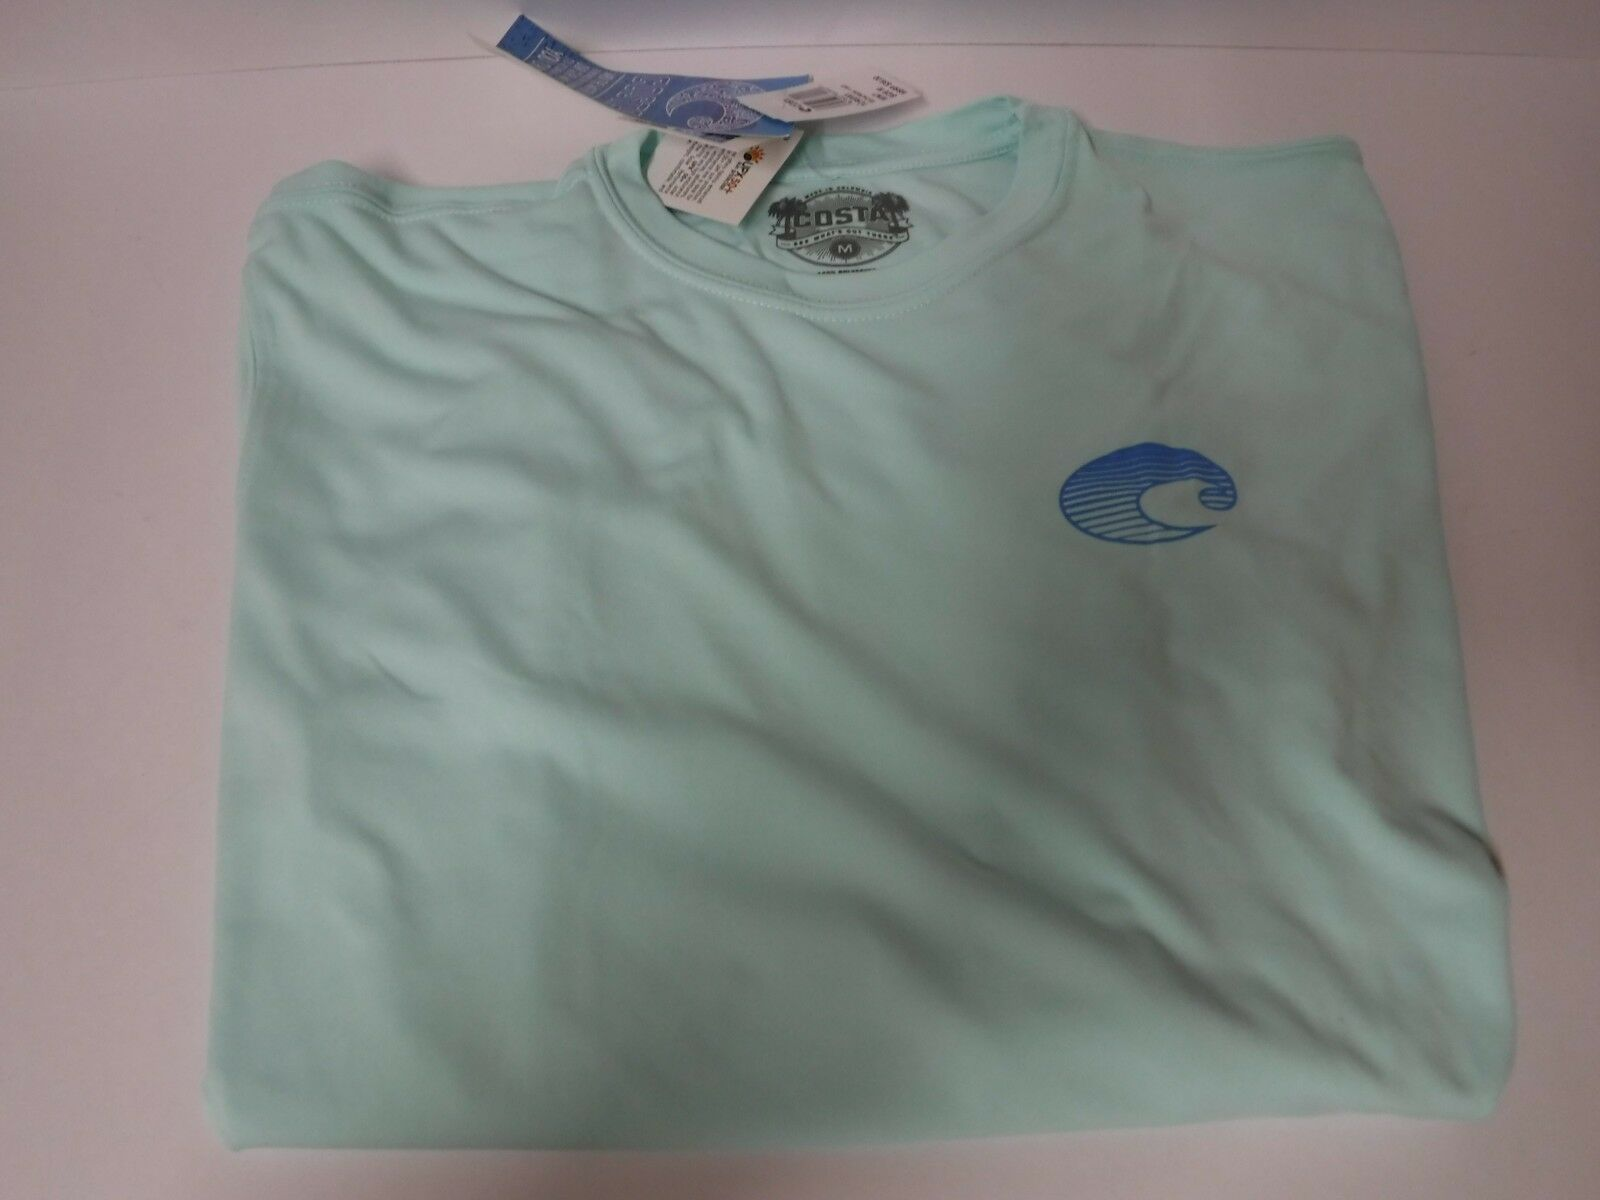 New Authentic Costa Del Mar Technical Crew Mint L S T Shirt   Shield   Large